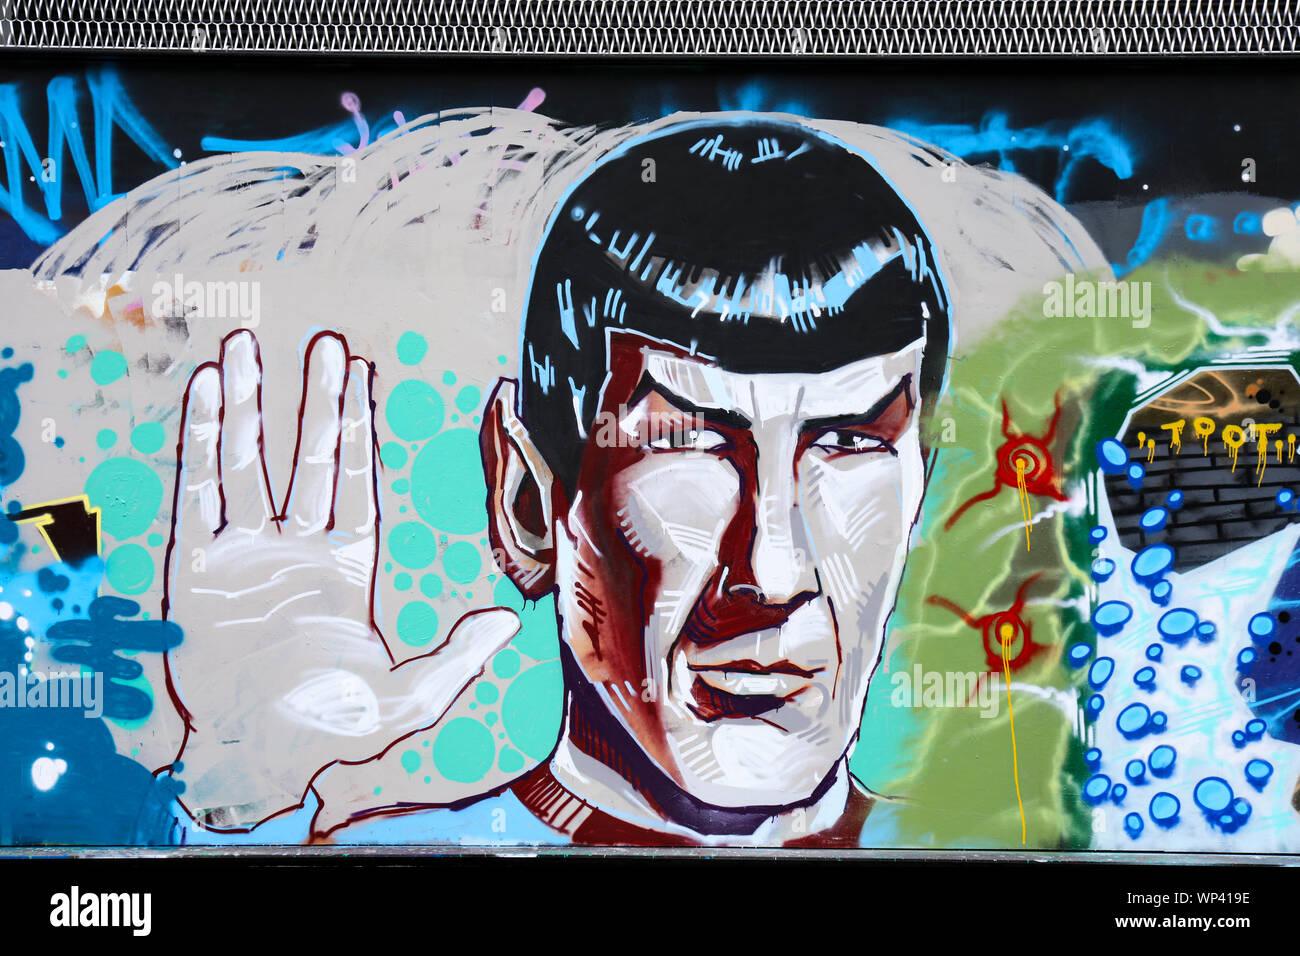 graffiti-of-leonard-nimoy-as-mr-spock-fr